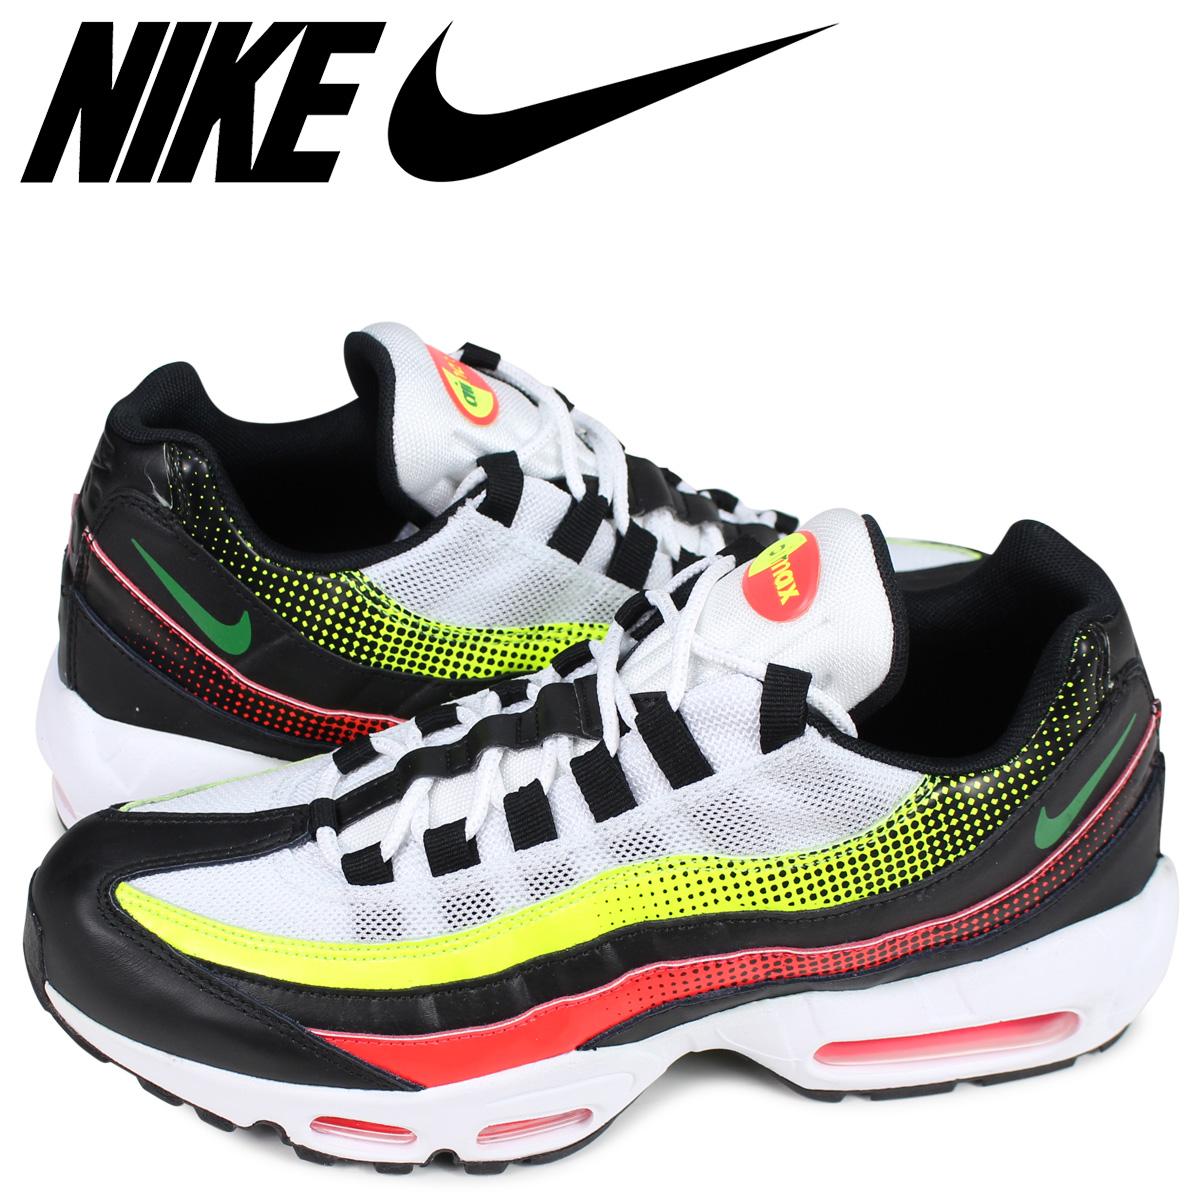 best cheap f4e28 56b03 NIKE AIR MAX 95 SE Kie Ney AMAX 95 sneakers men black black AJ2018-004  4 19  Shinnyu load